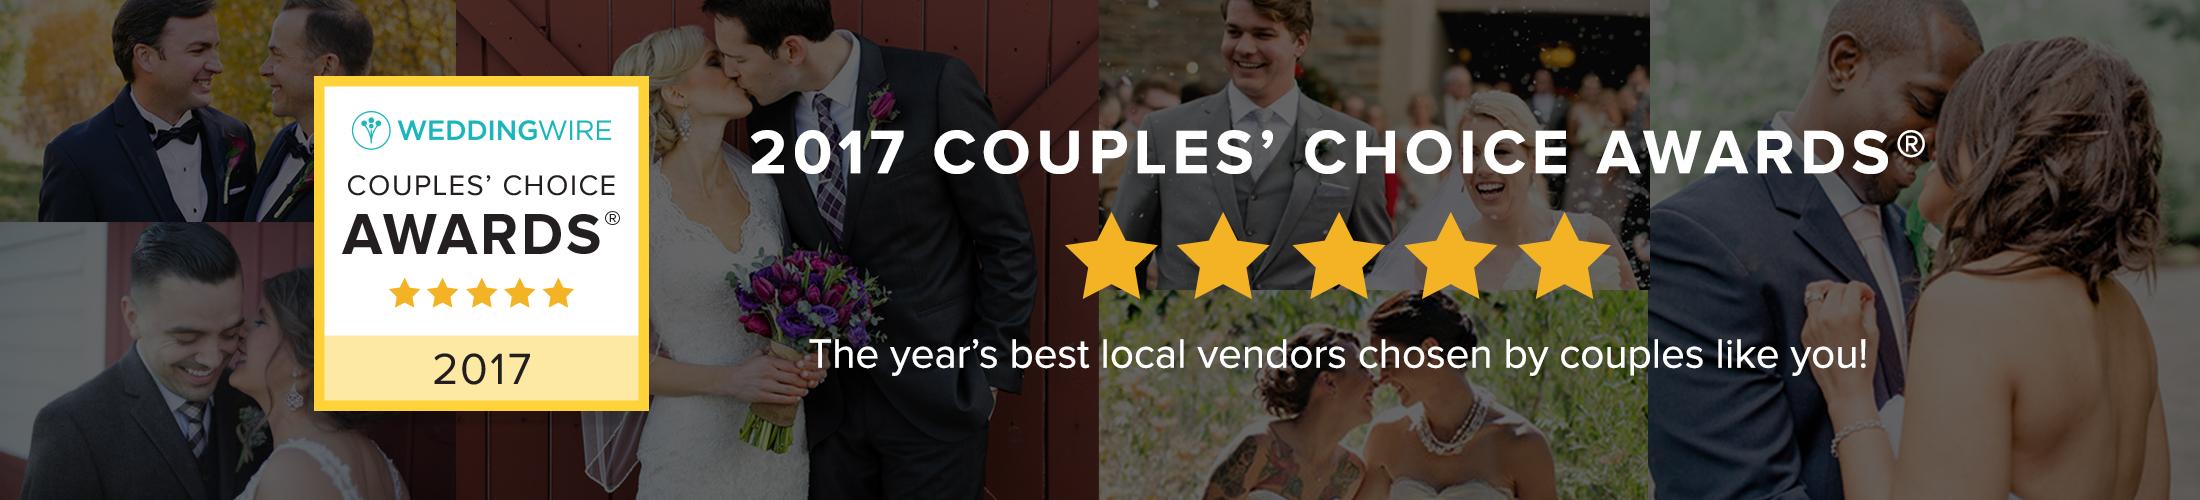 WeddingWire Couples' Choice Award® 2017